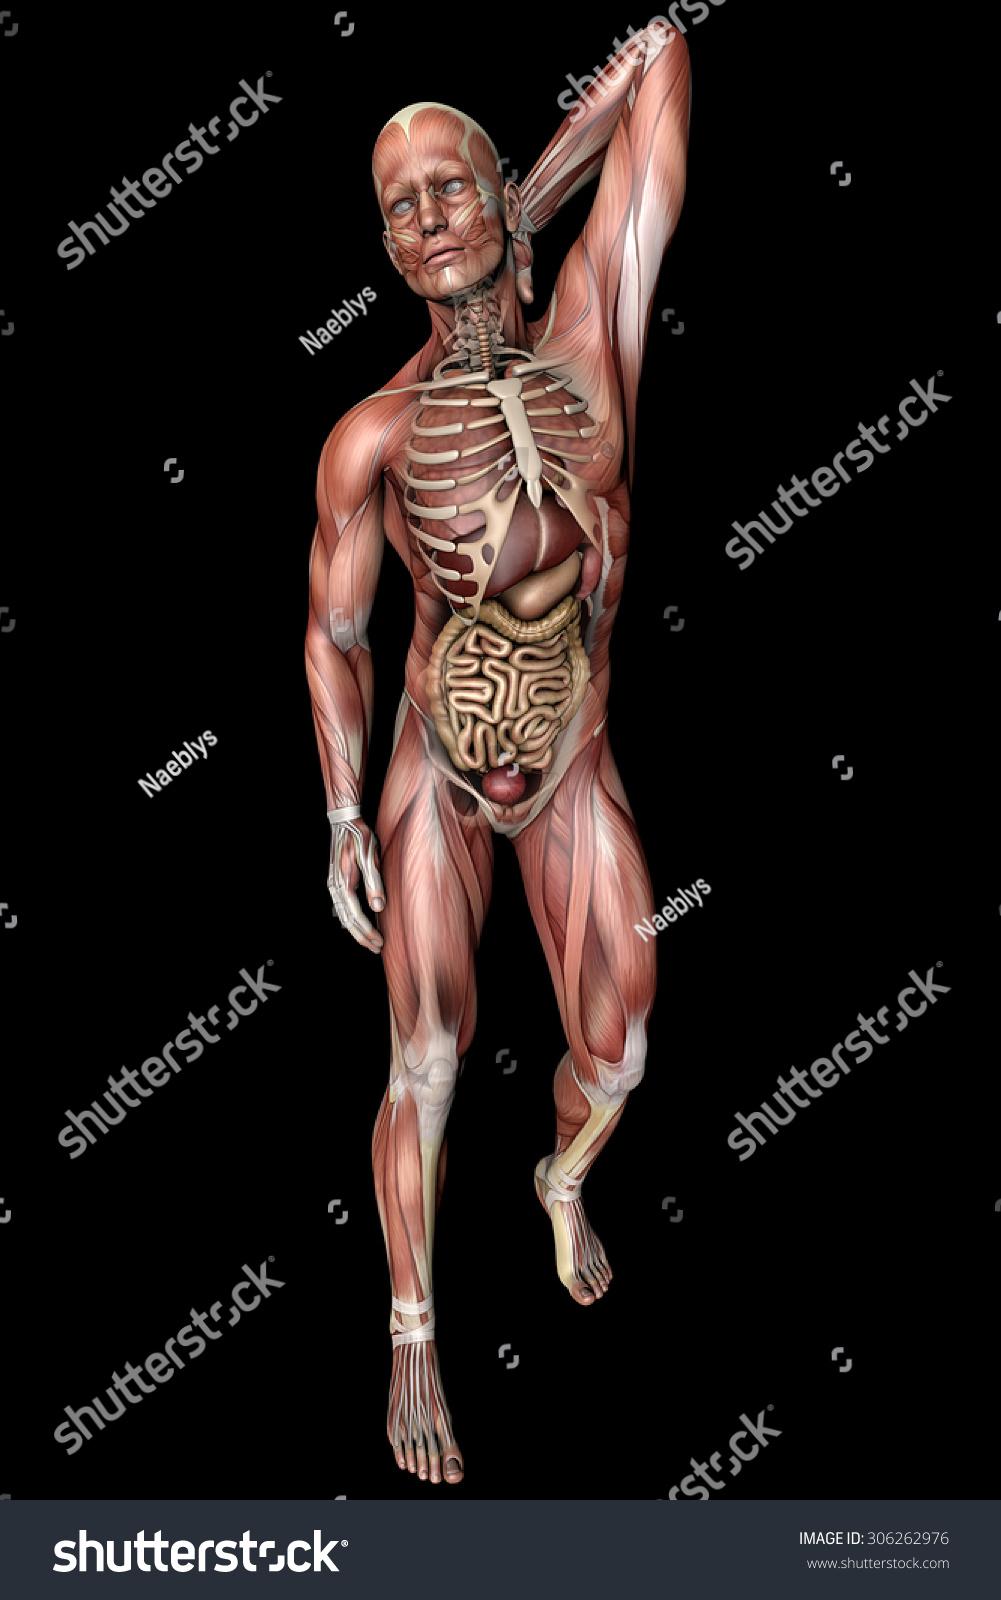 Man Anatomy Body Muscles Skeleton Stock Illustration 306262976 ...